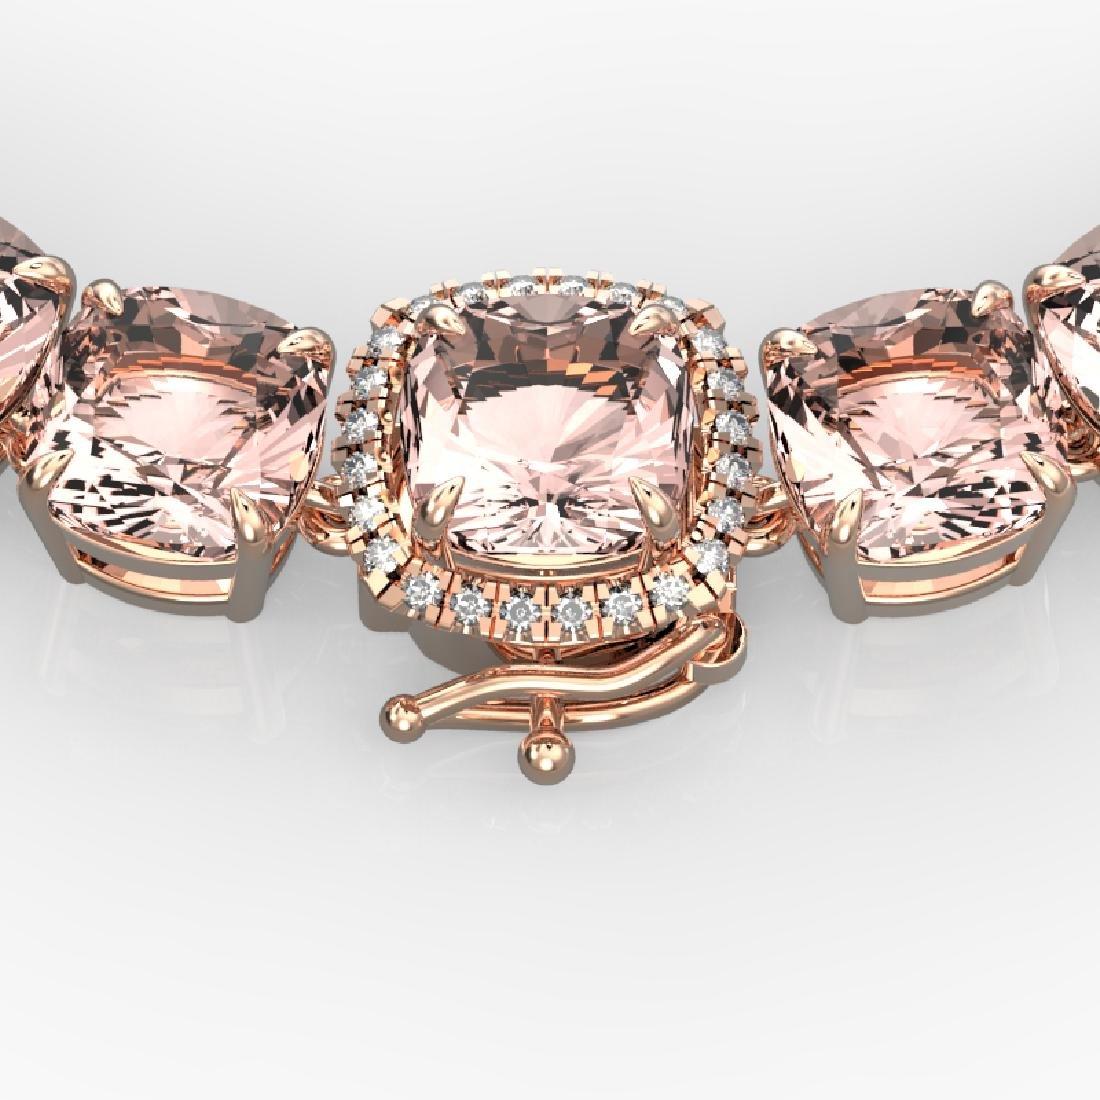 87 CTW Morganite & VS/SI Diamond Pave Necklace 14K Rose